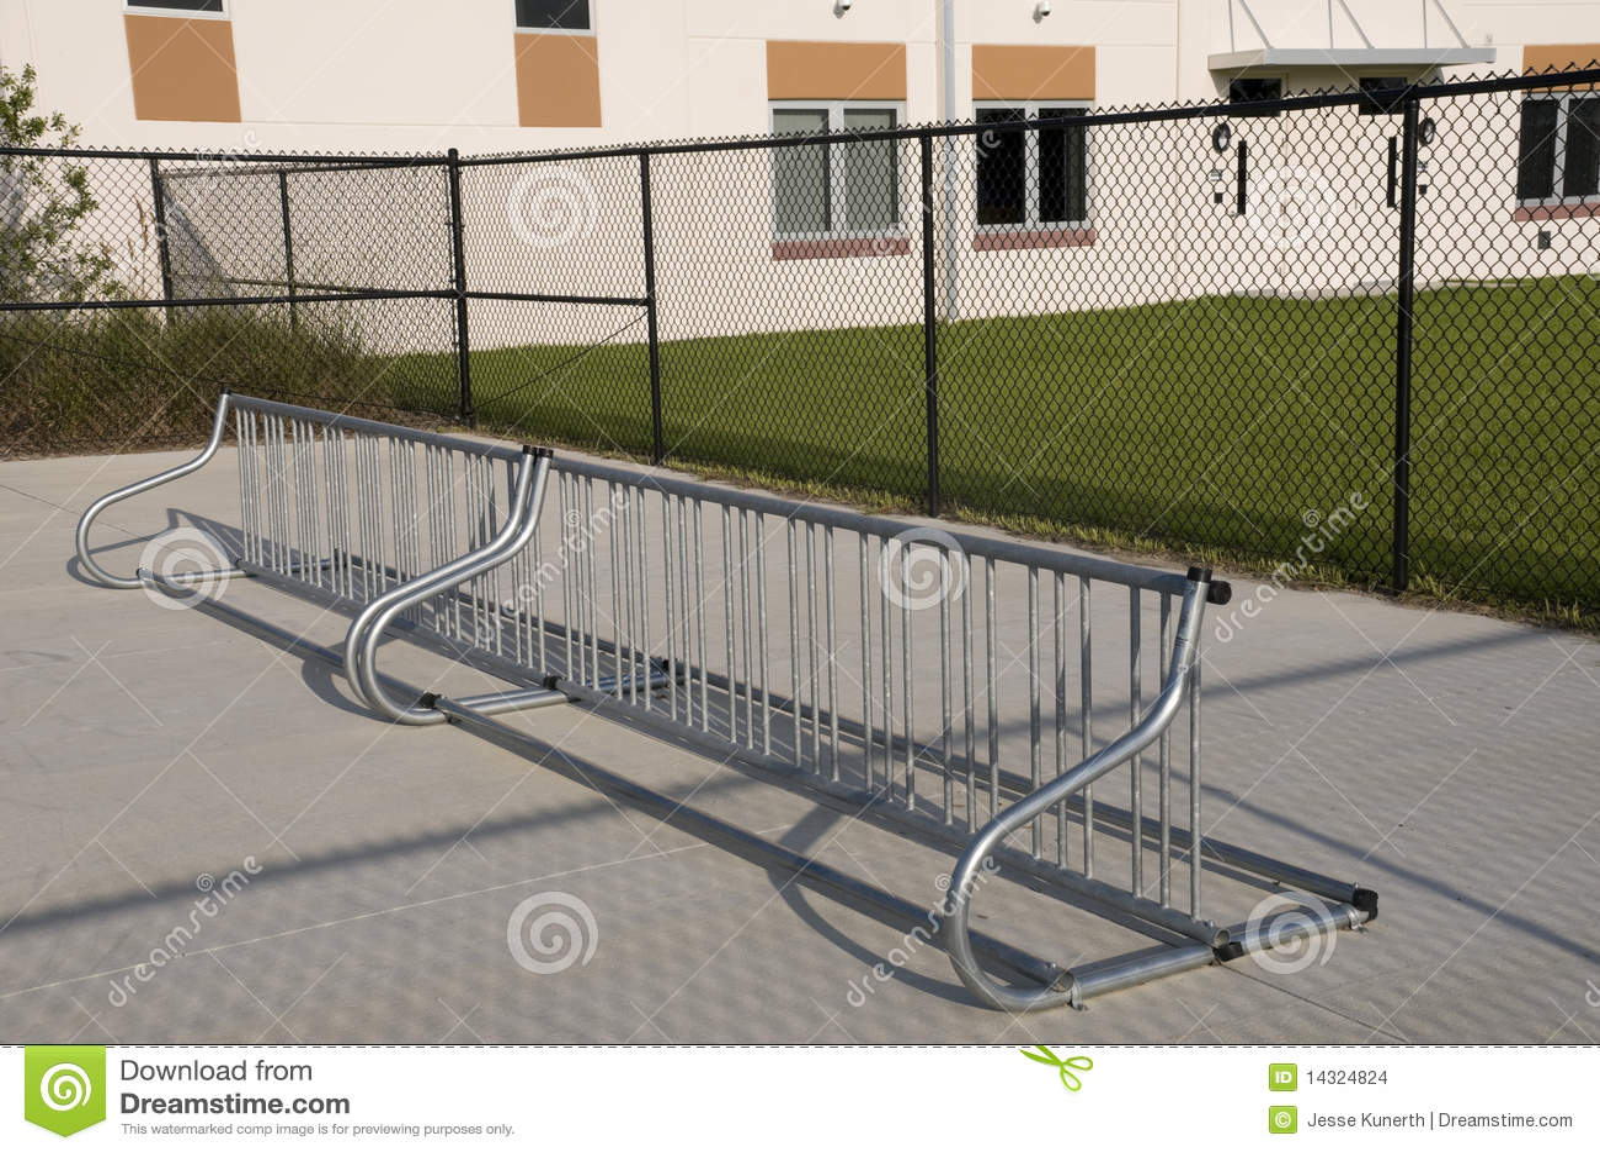 Bike Rack At Elementary School Stock Images Image 14324824